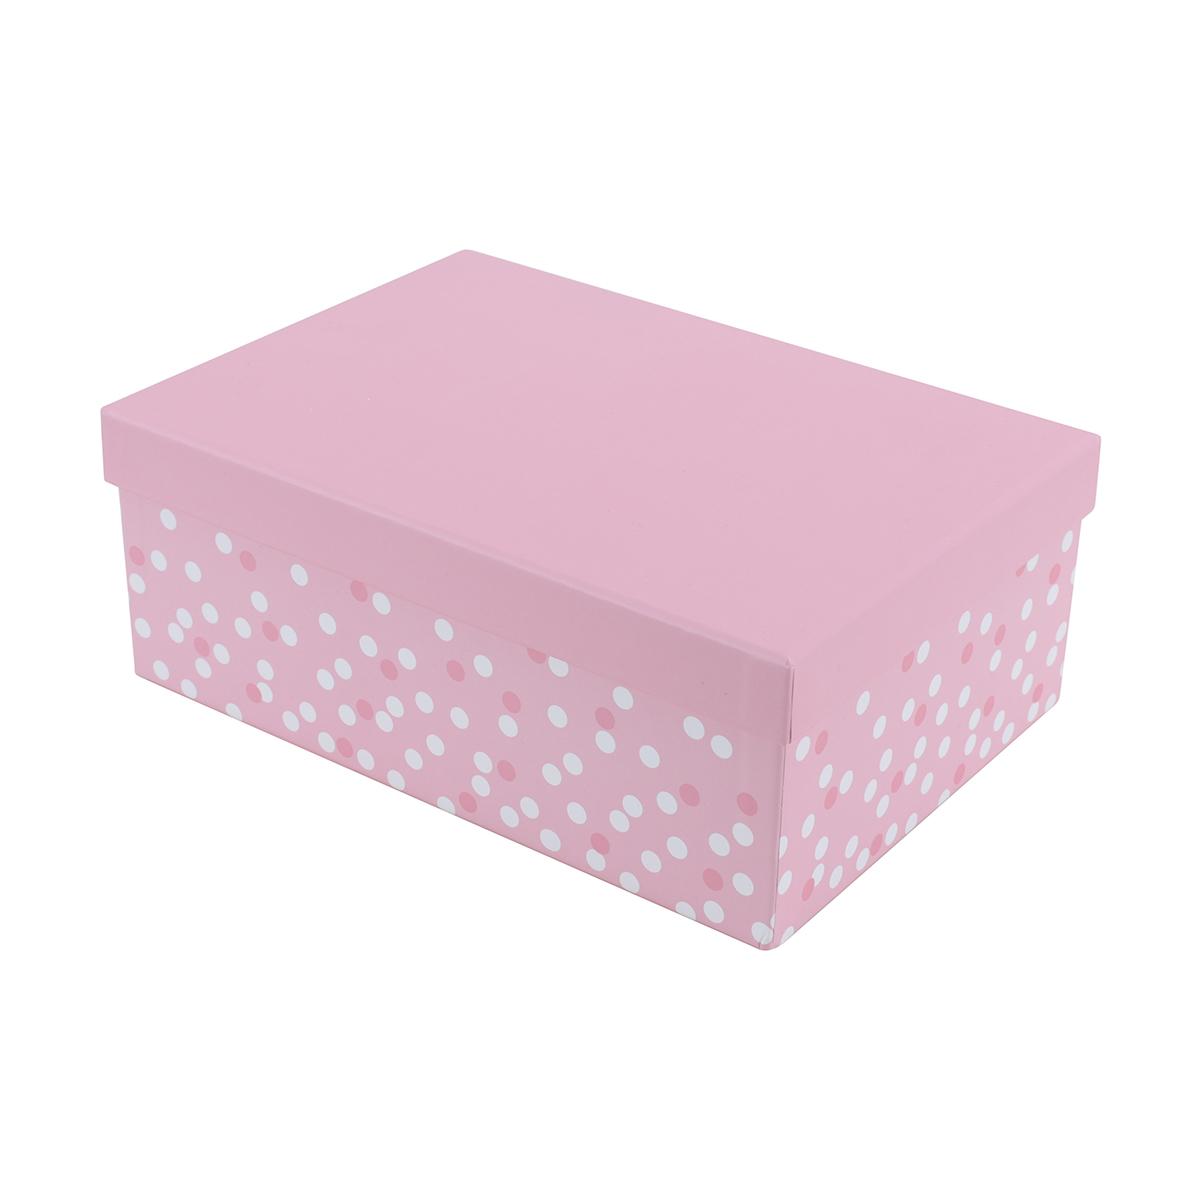 Pink Spot Gift Box Kmart